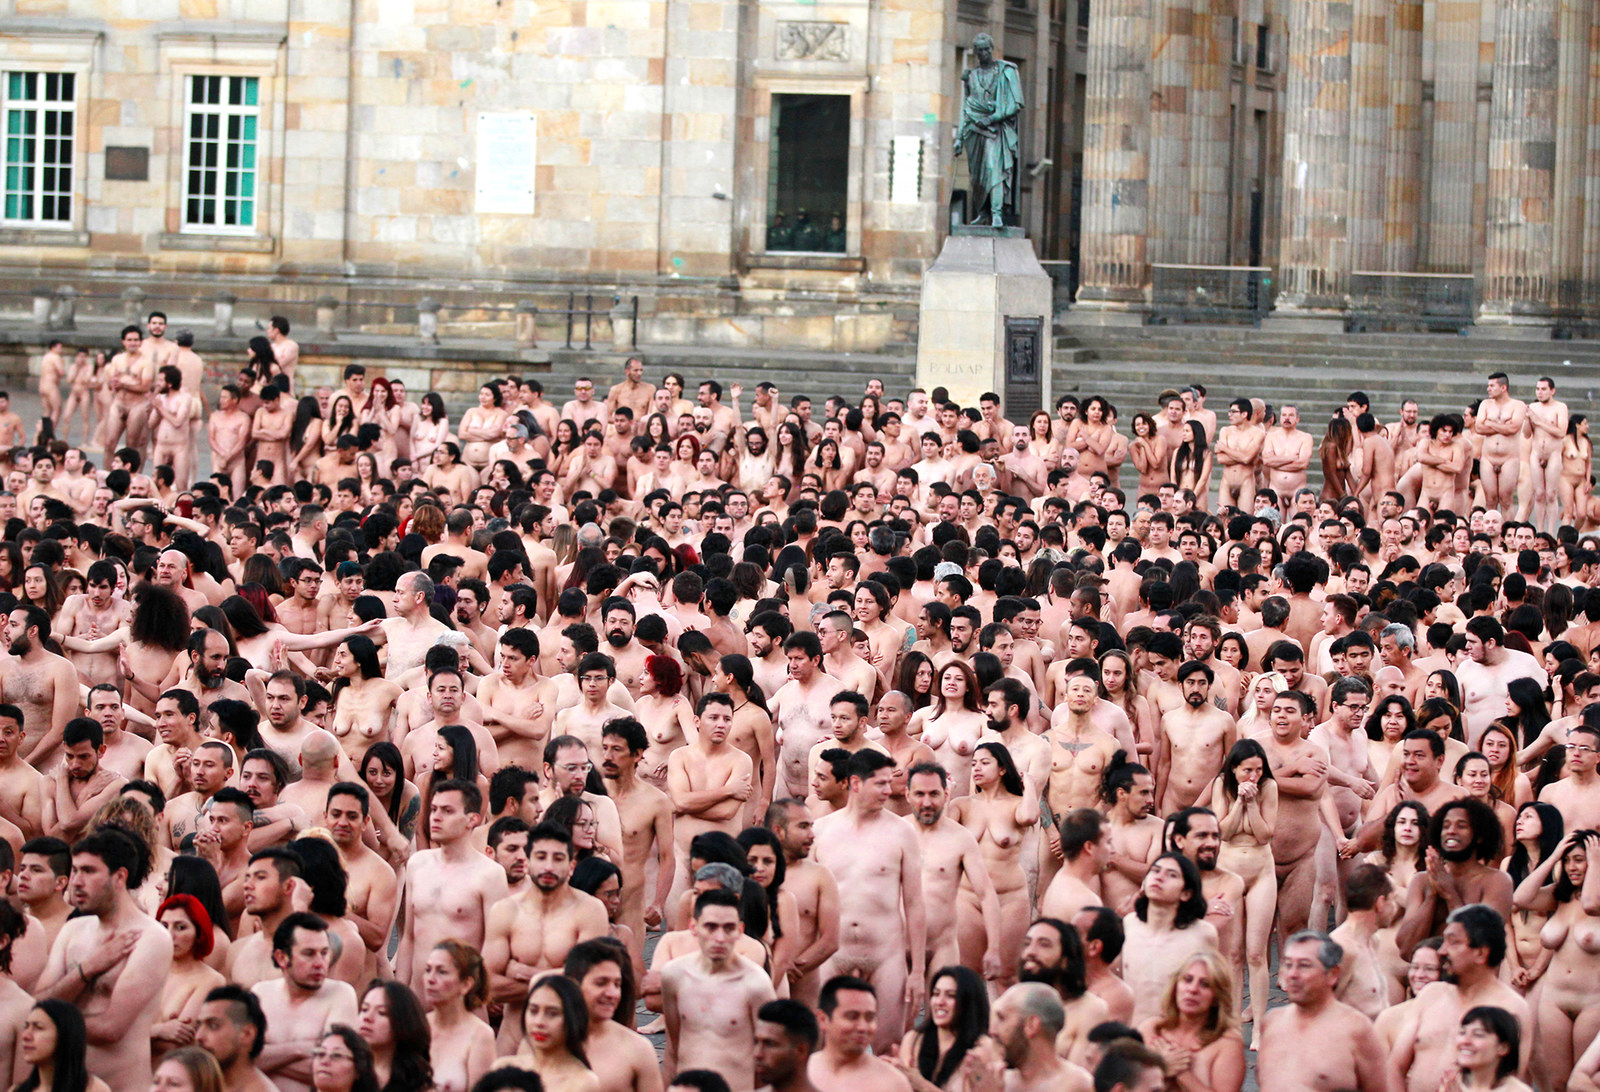 Linda Bollea Nude, Topless Pictures, Playboy Photos, Sex Scene Uncensored